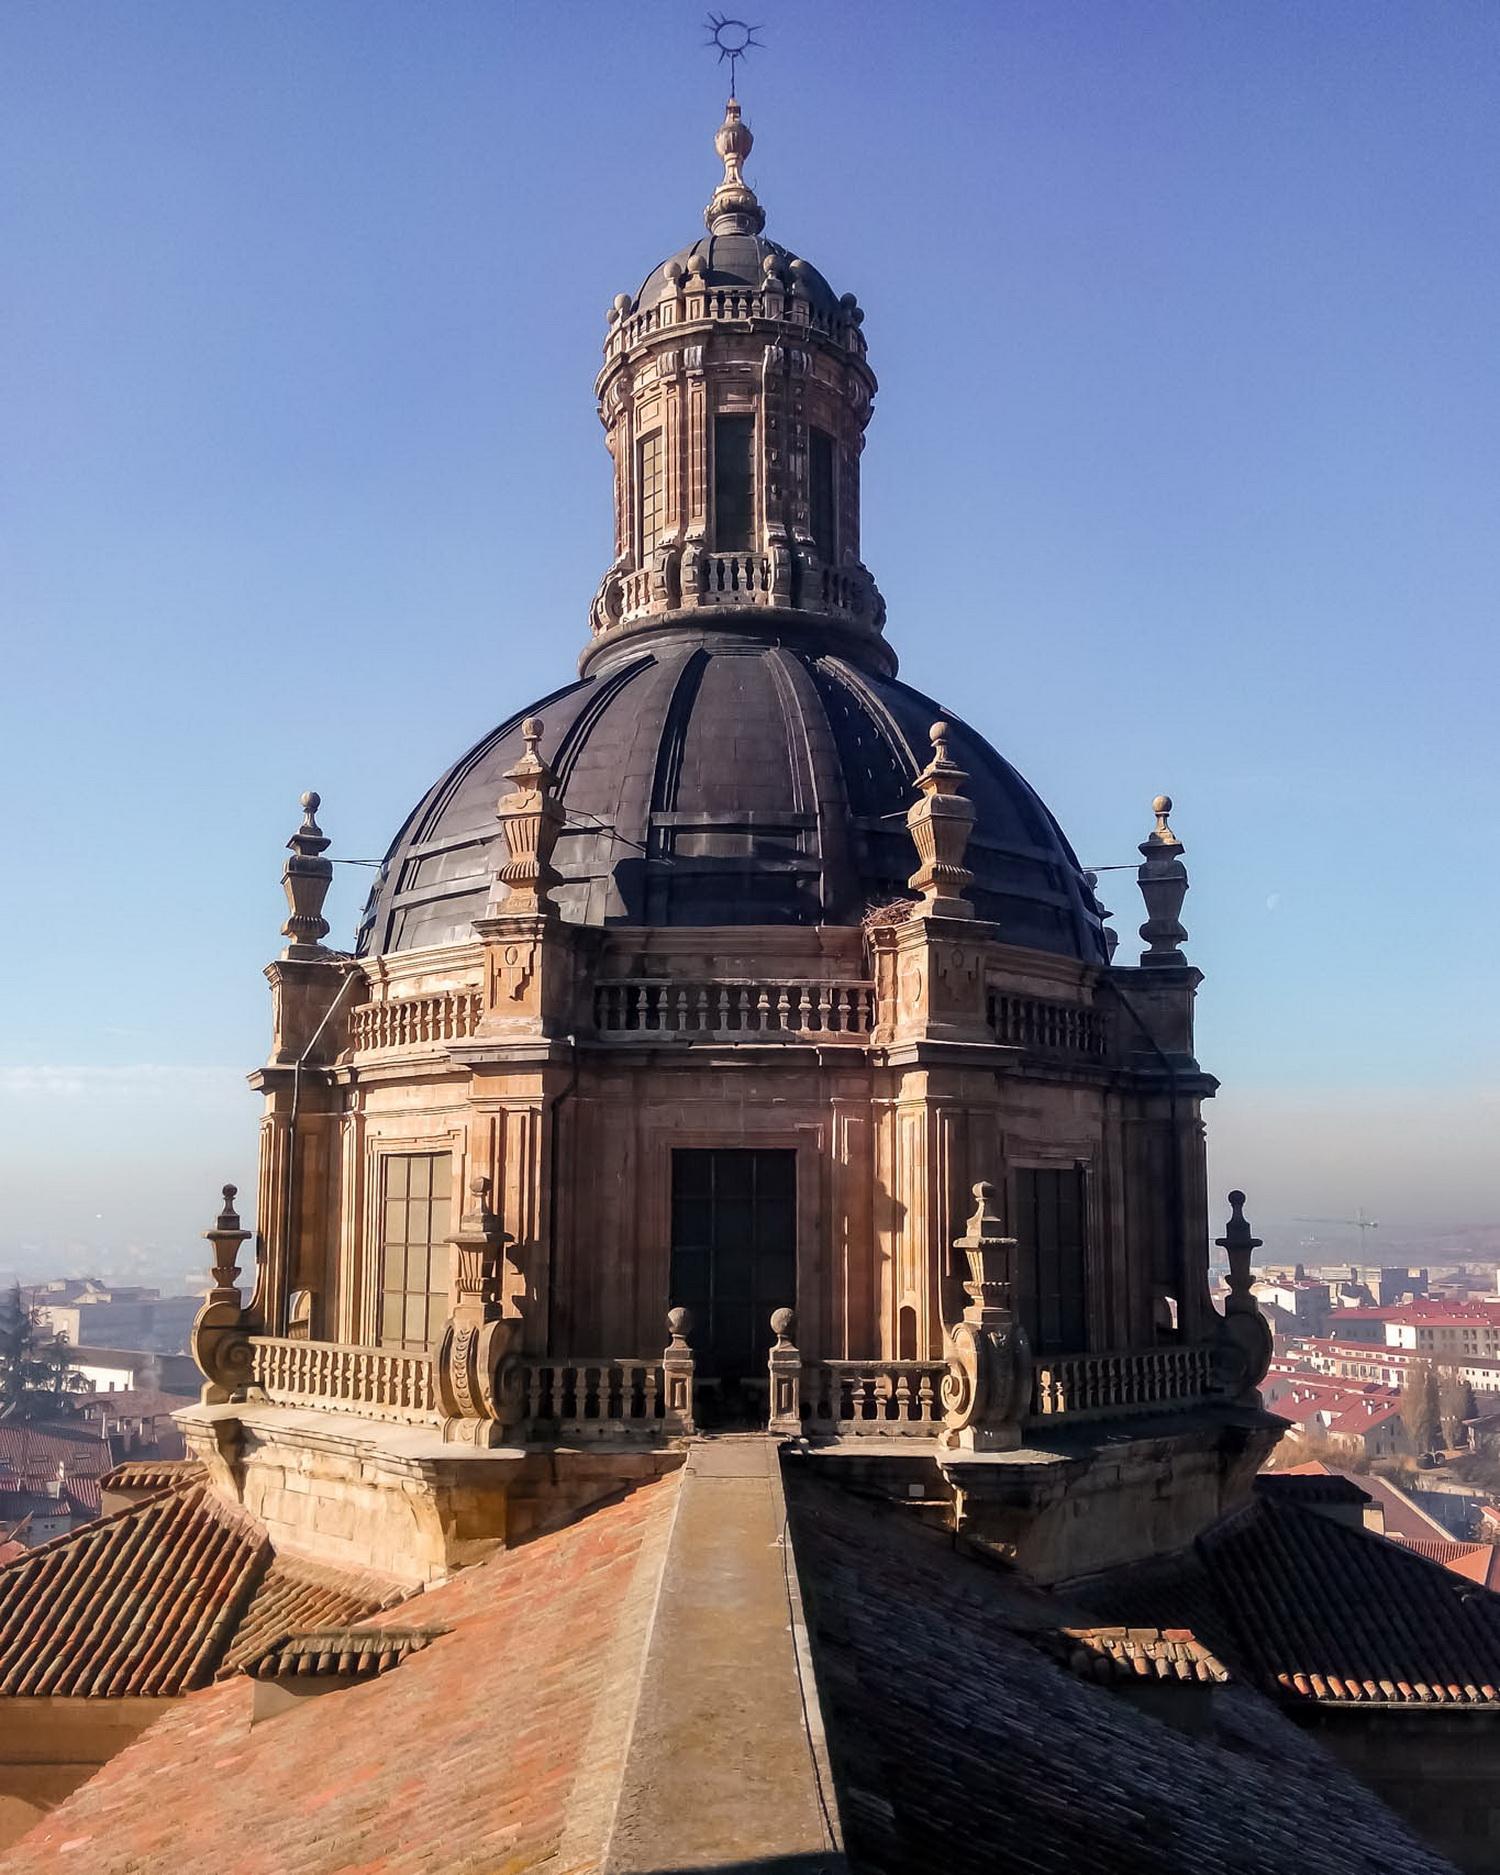 Spania_Salamanca_UniversidadPontificia